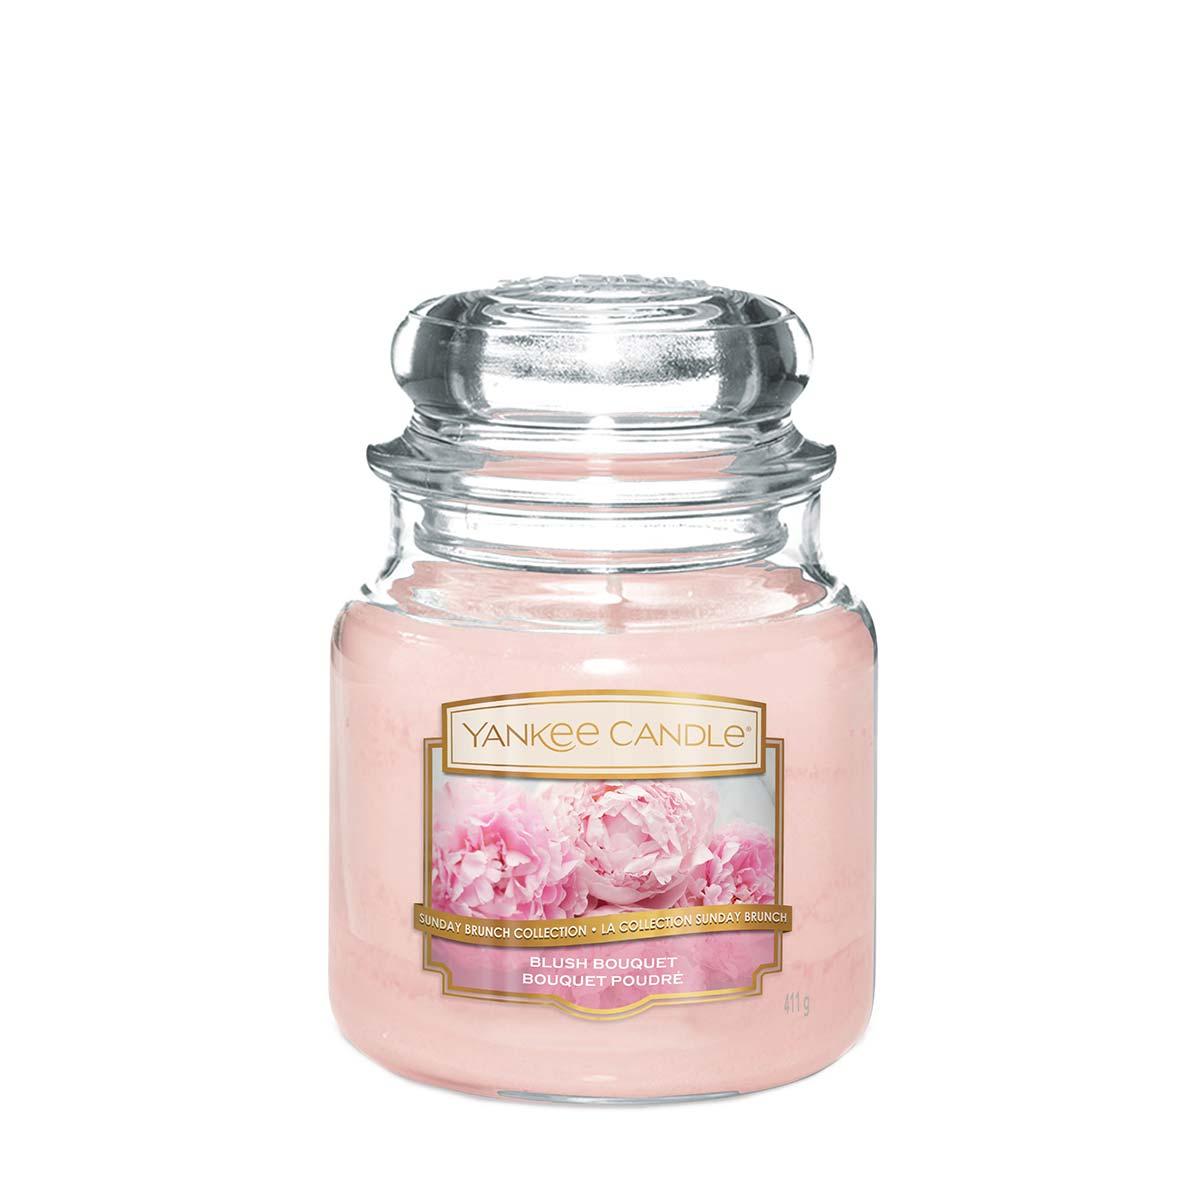 Yankee Candle Jar Medium Blush Bouquet